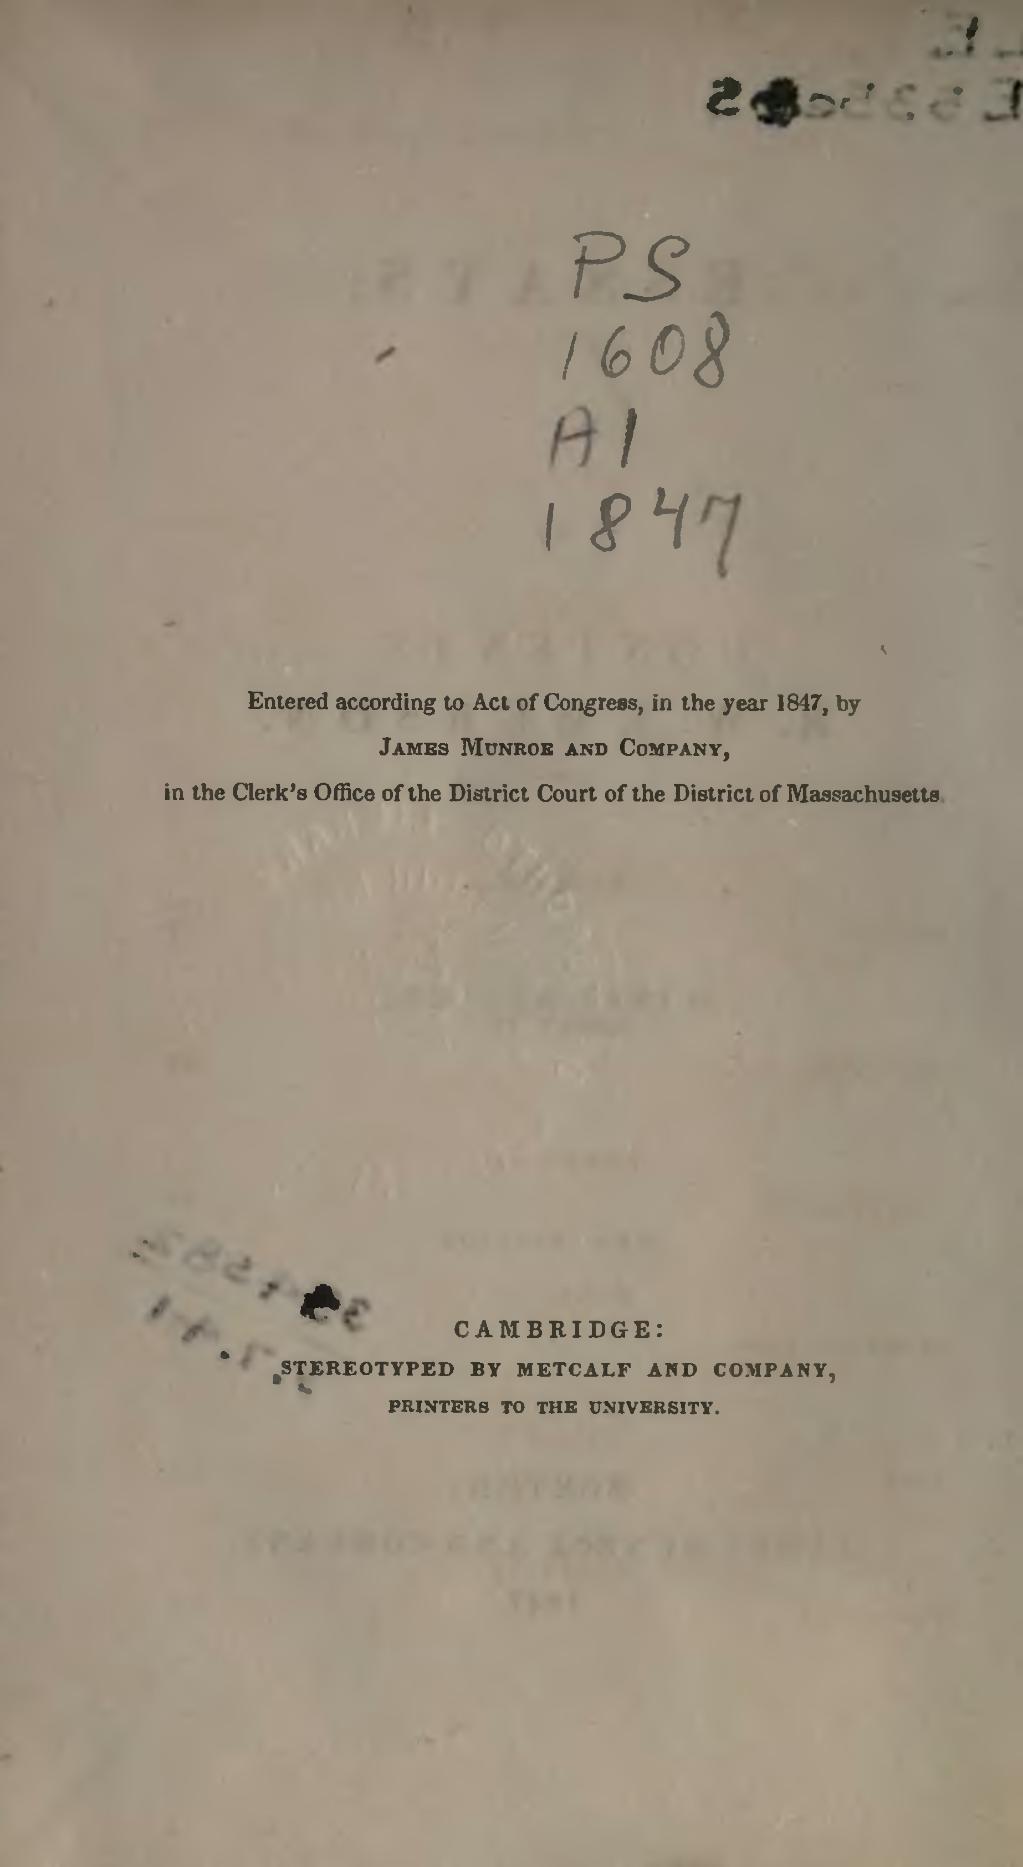 014 Essays First Series Page10 1024px Essays2c 28184729 Djvu Essay Stunning Emerson Pdf Shelburne Publisher Full